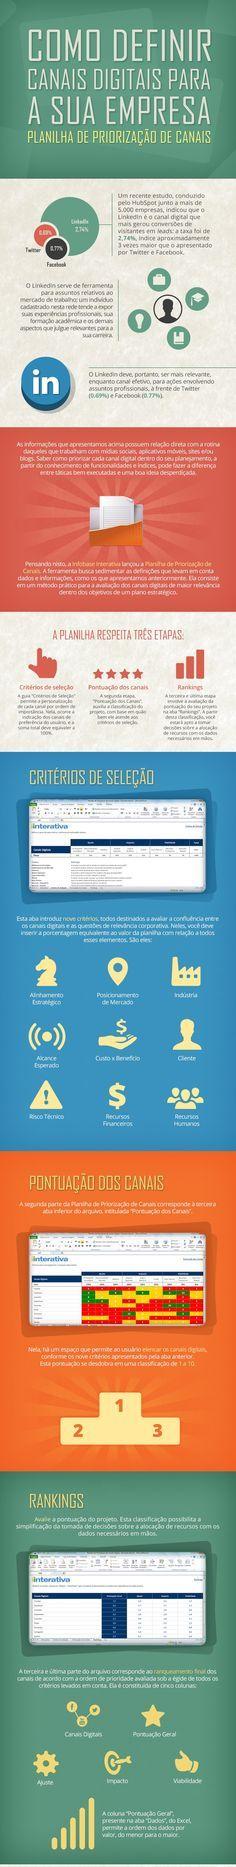 Infográfico: Canais Digitais para Empresas   Fonte: IInterativa